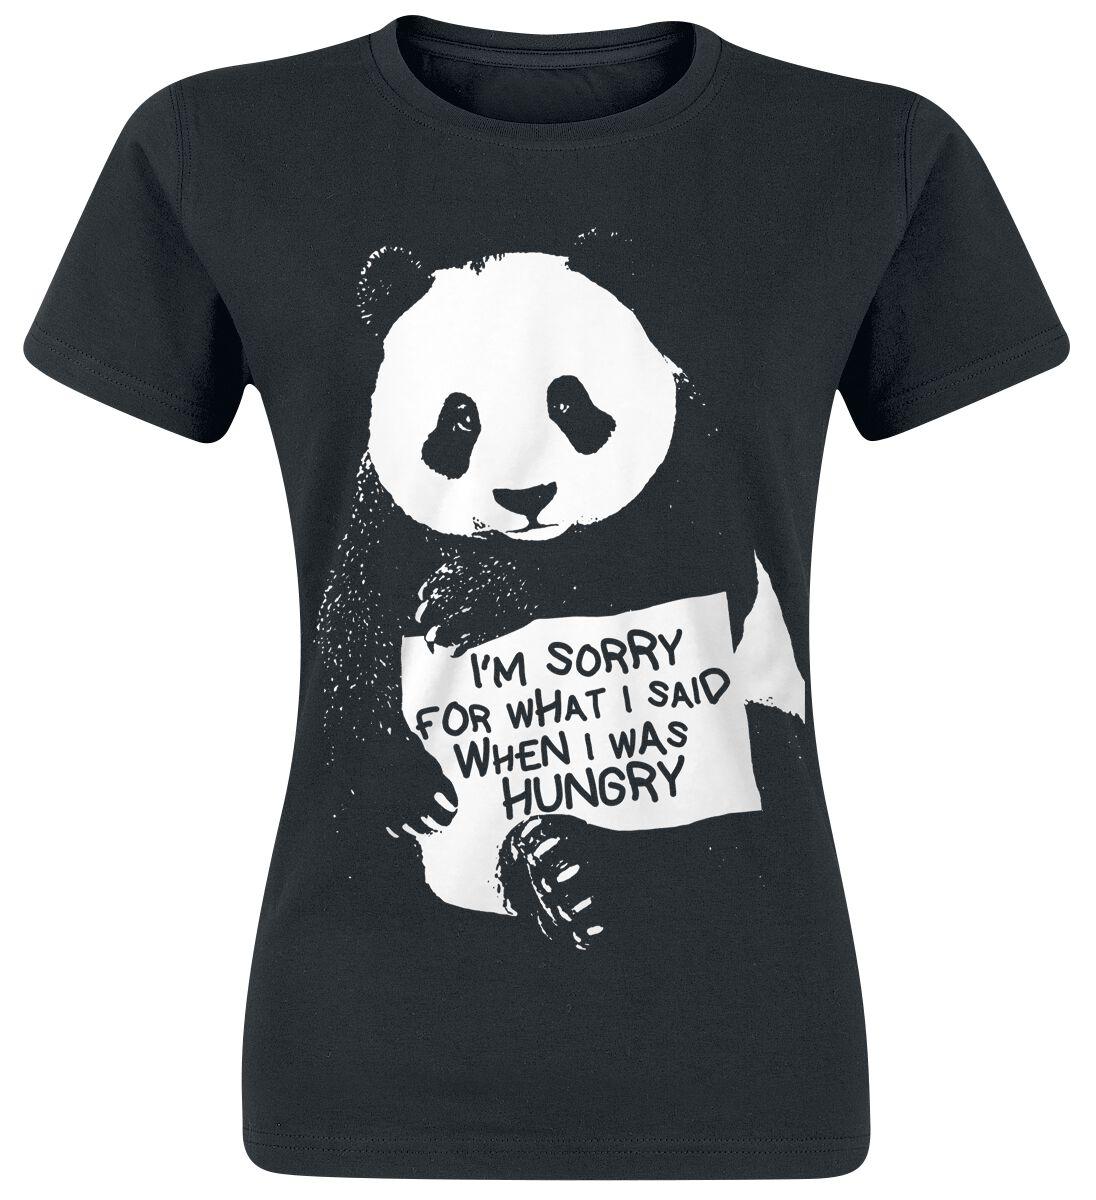 Fun Shirts - Koszulki - Koszulka damska I'm Sorry... Koszulka damska czarny - 345044